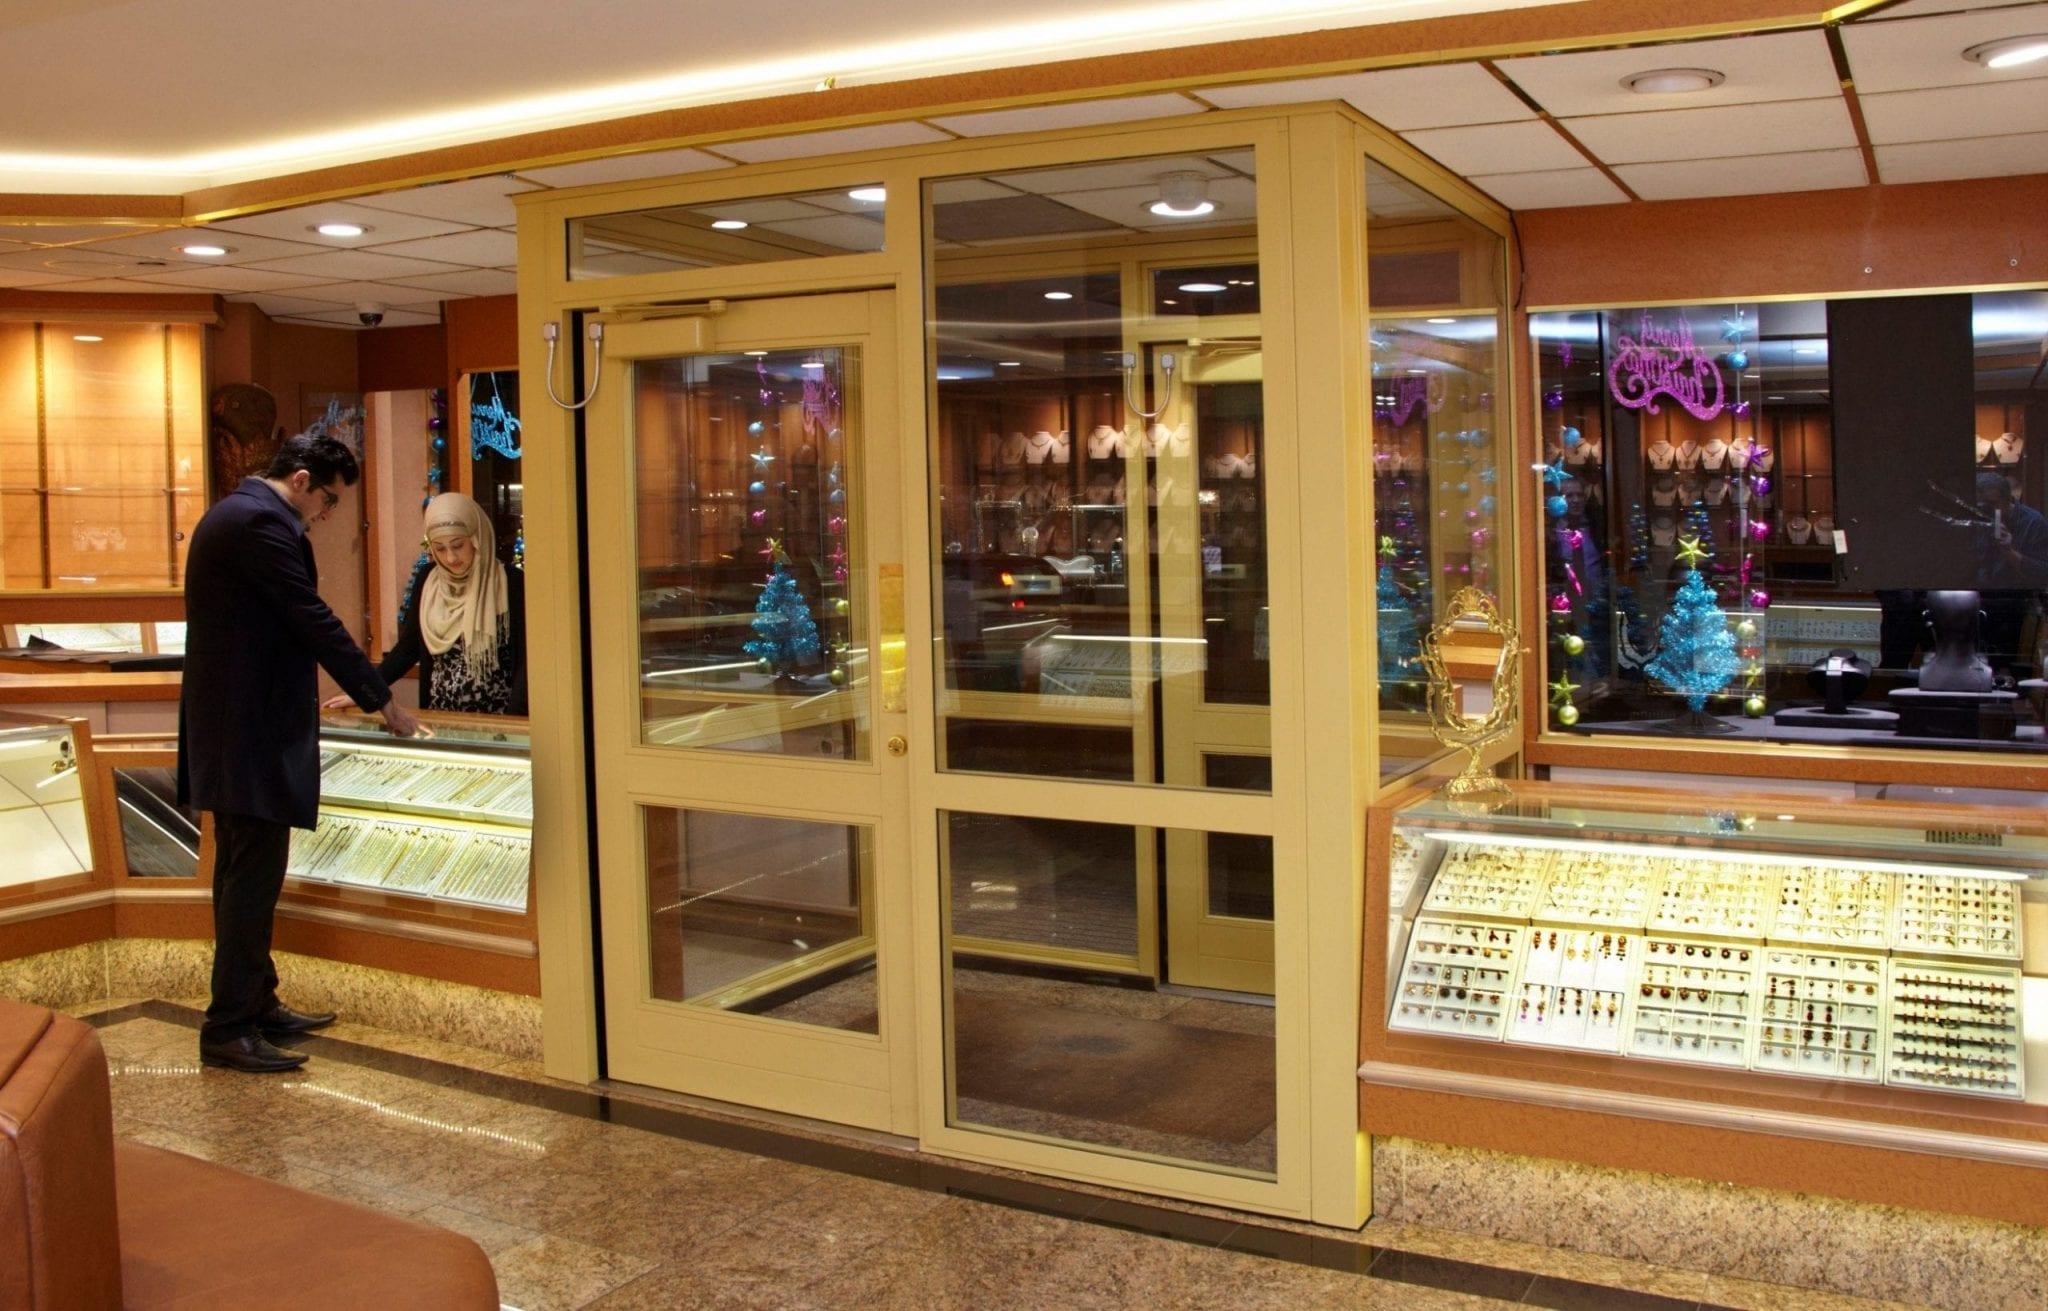 interlocking doors and staff member behind counter serving customer